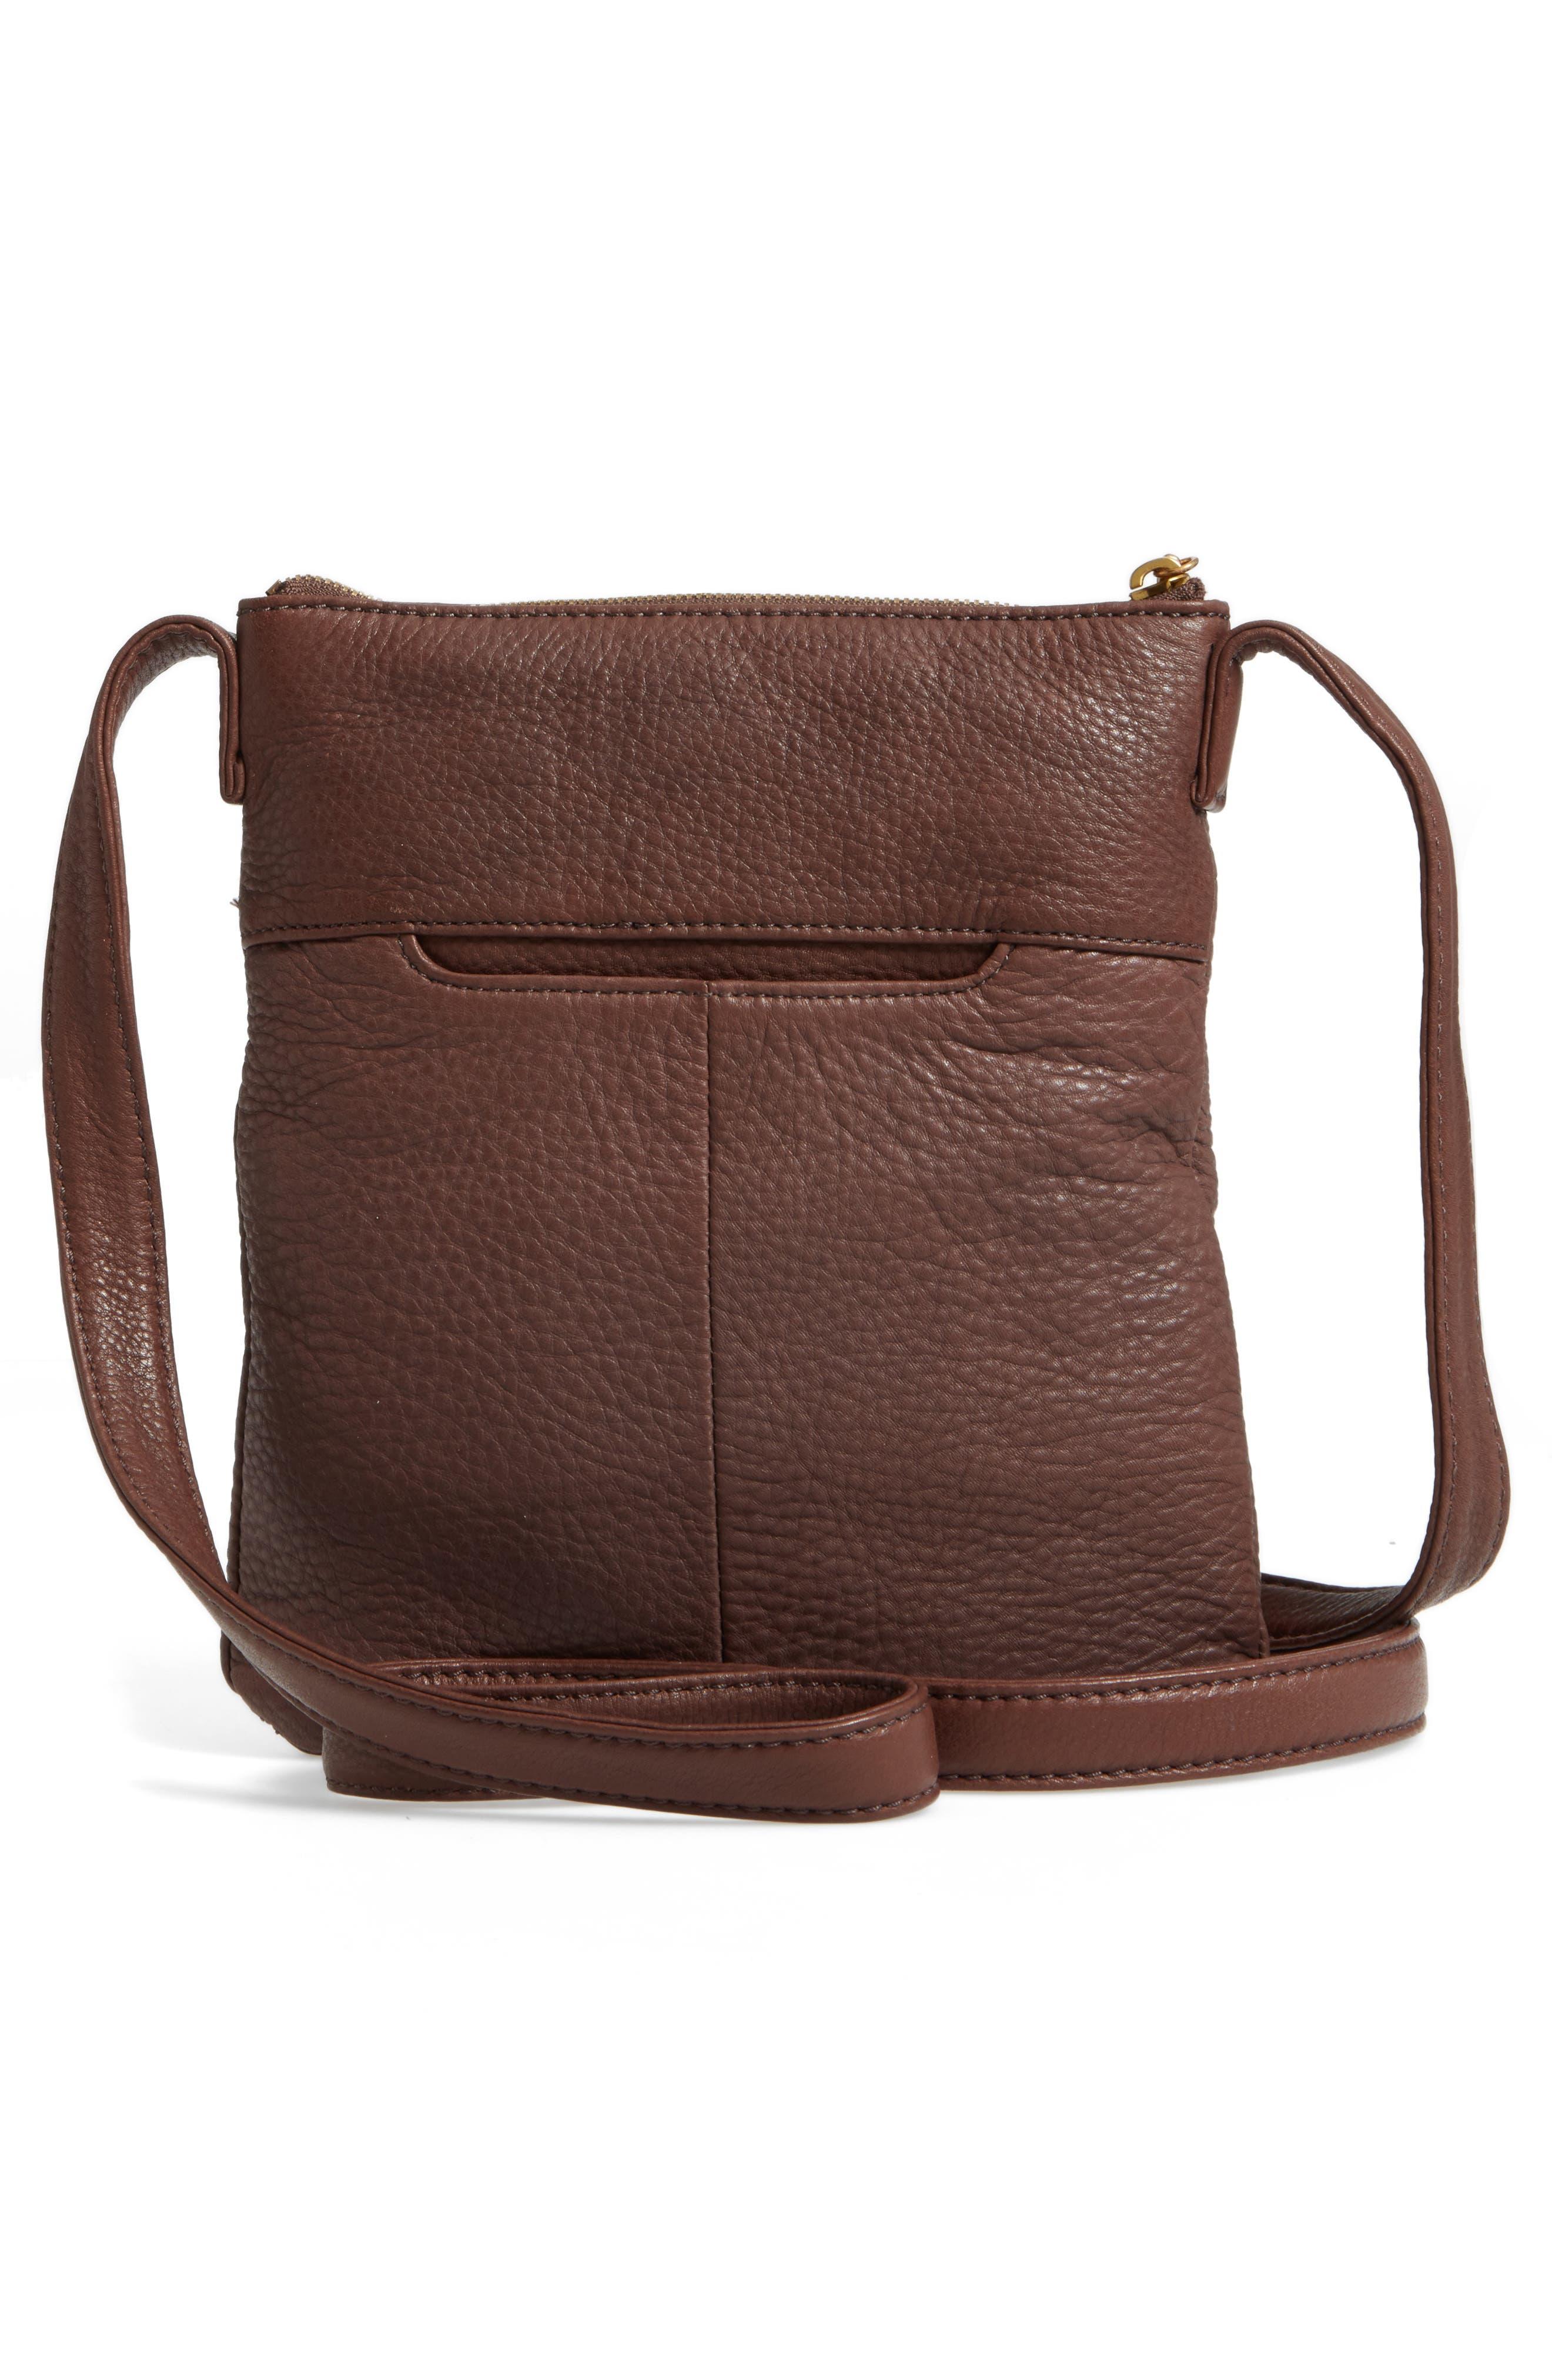 'Sarah' Leather Crossbody Bag,                             Alternate thumbnail 14, color,